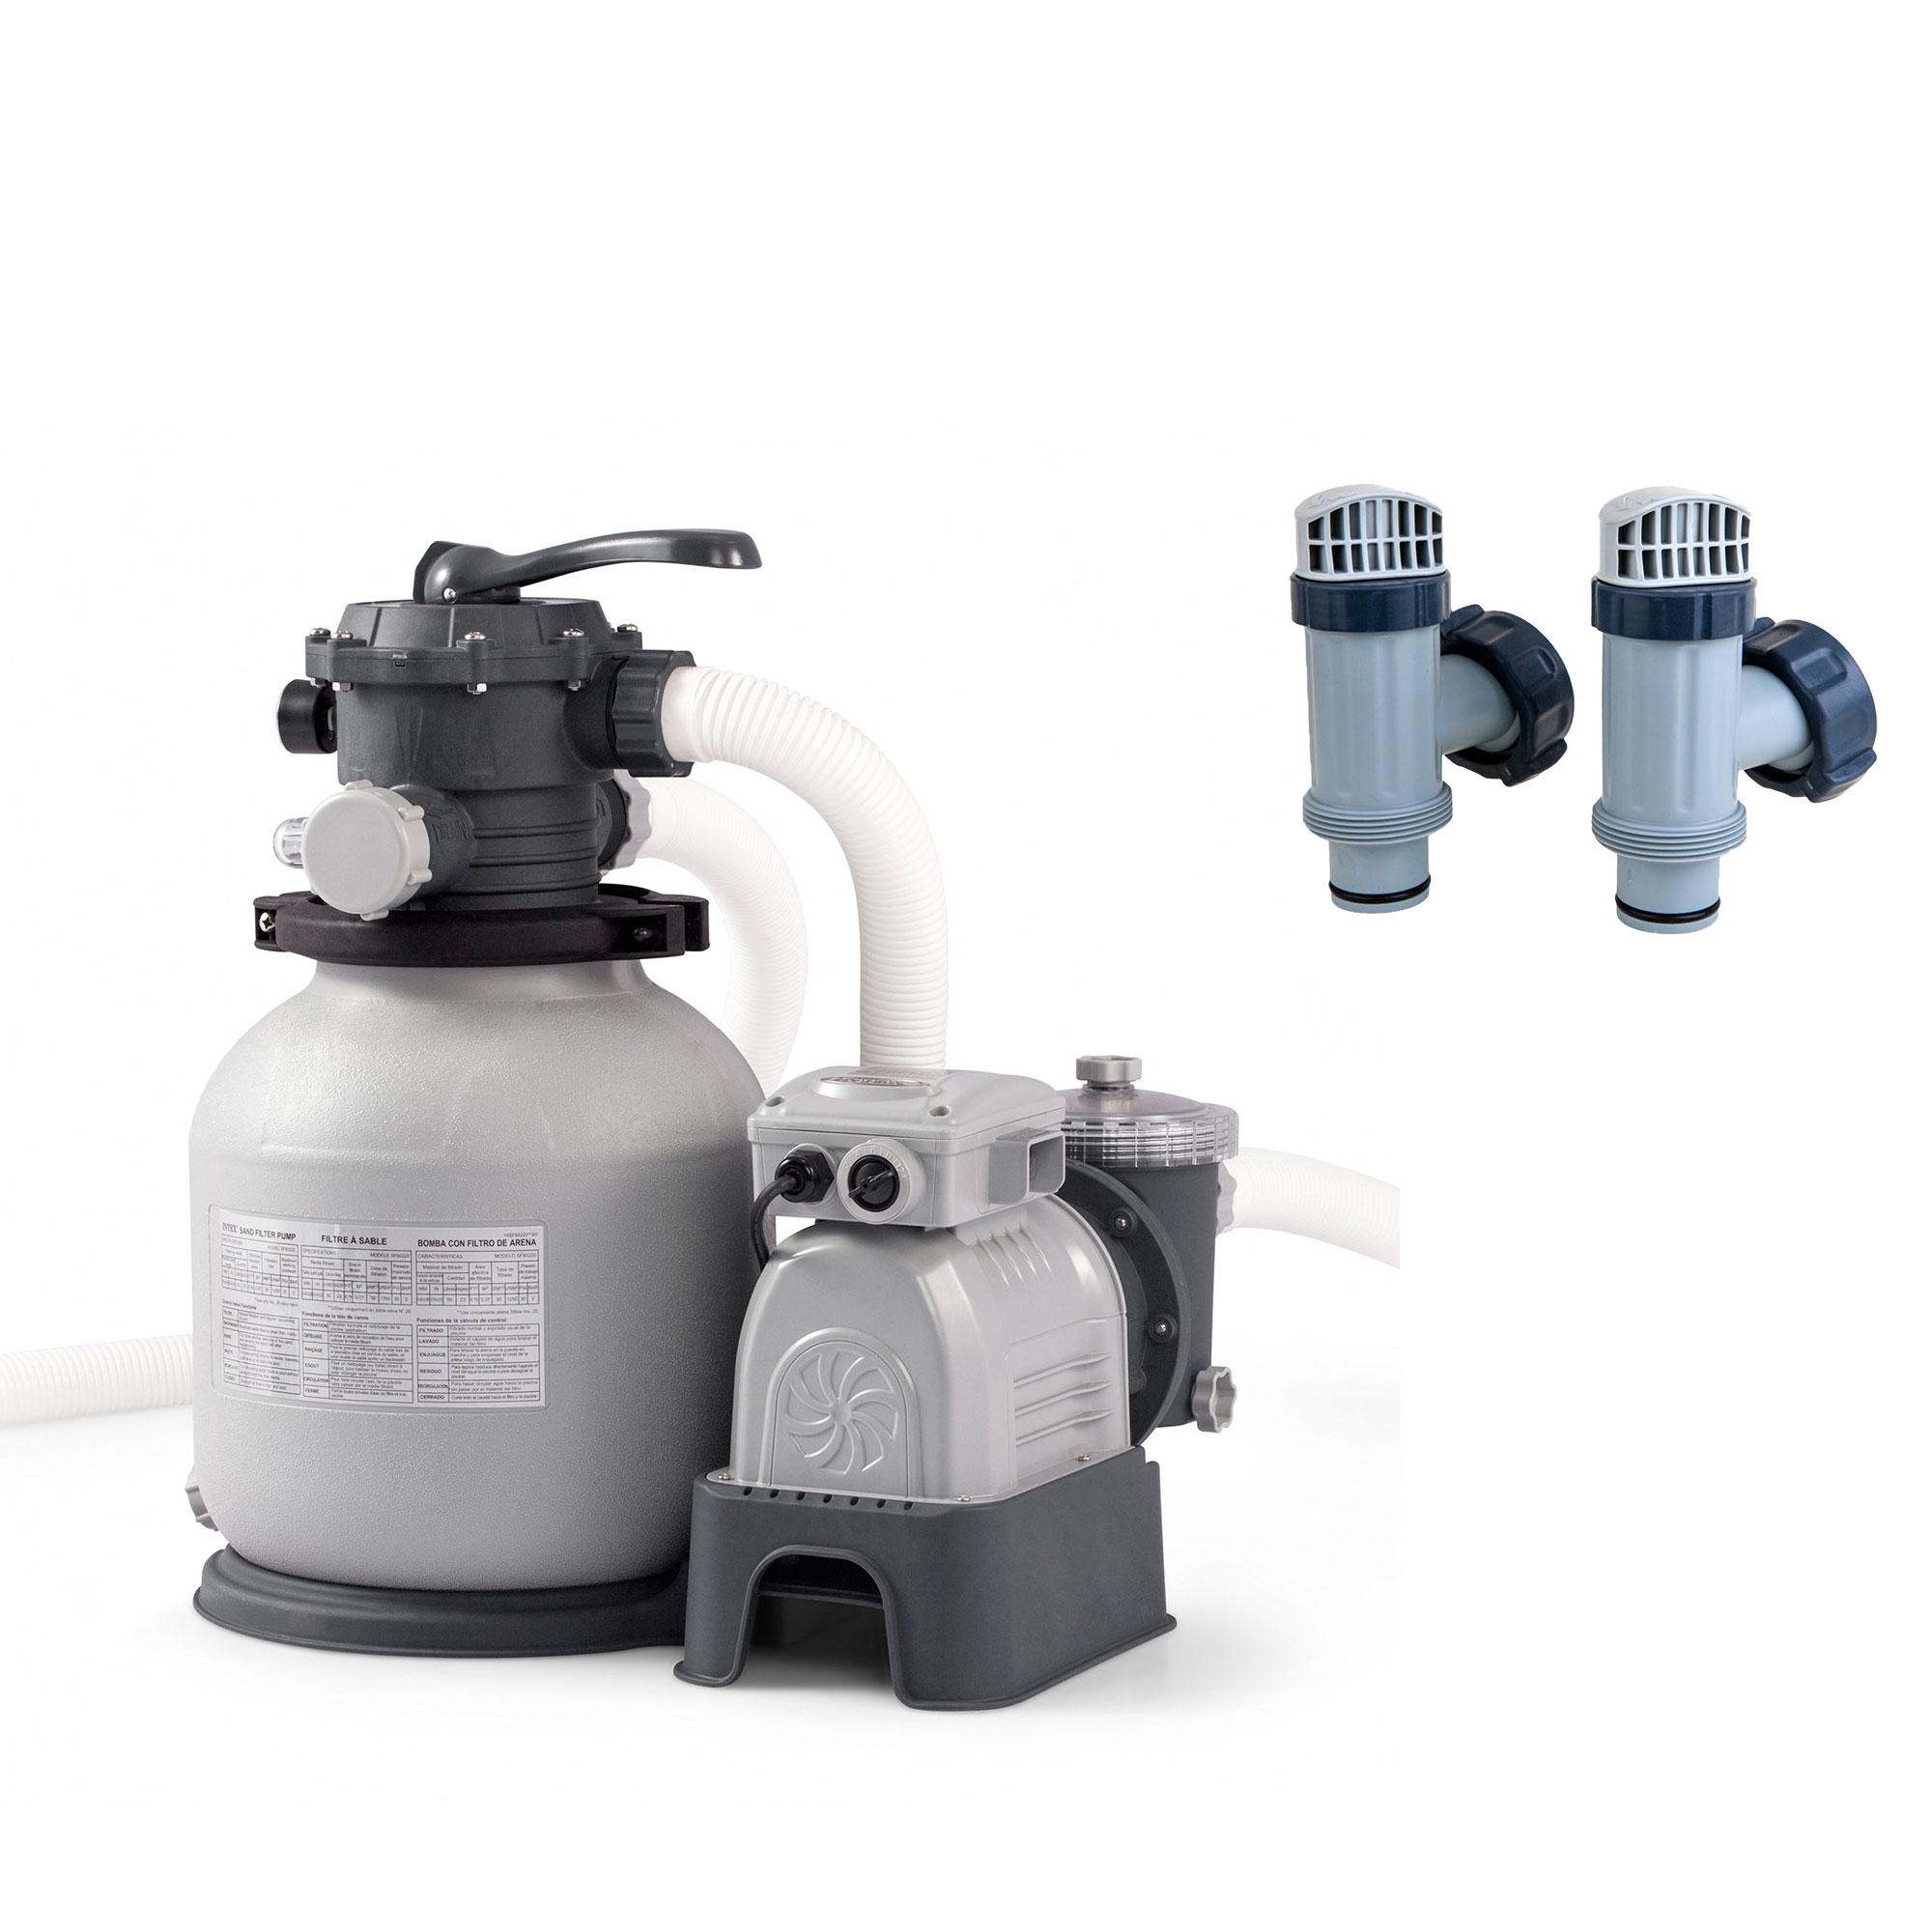 Intex Above Ground Plunger Valves w/ Gaskets & Nuts (2 Pack) & Sand Filter Pump